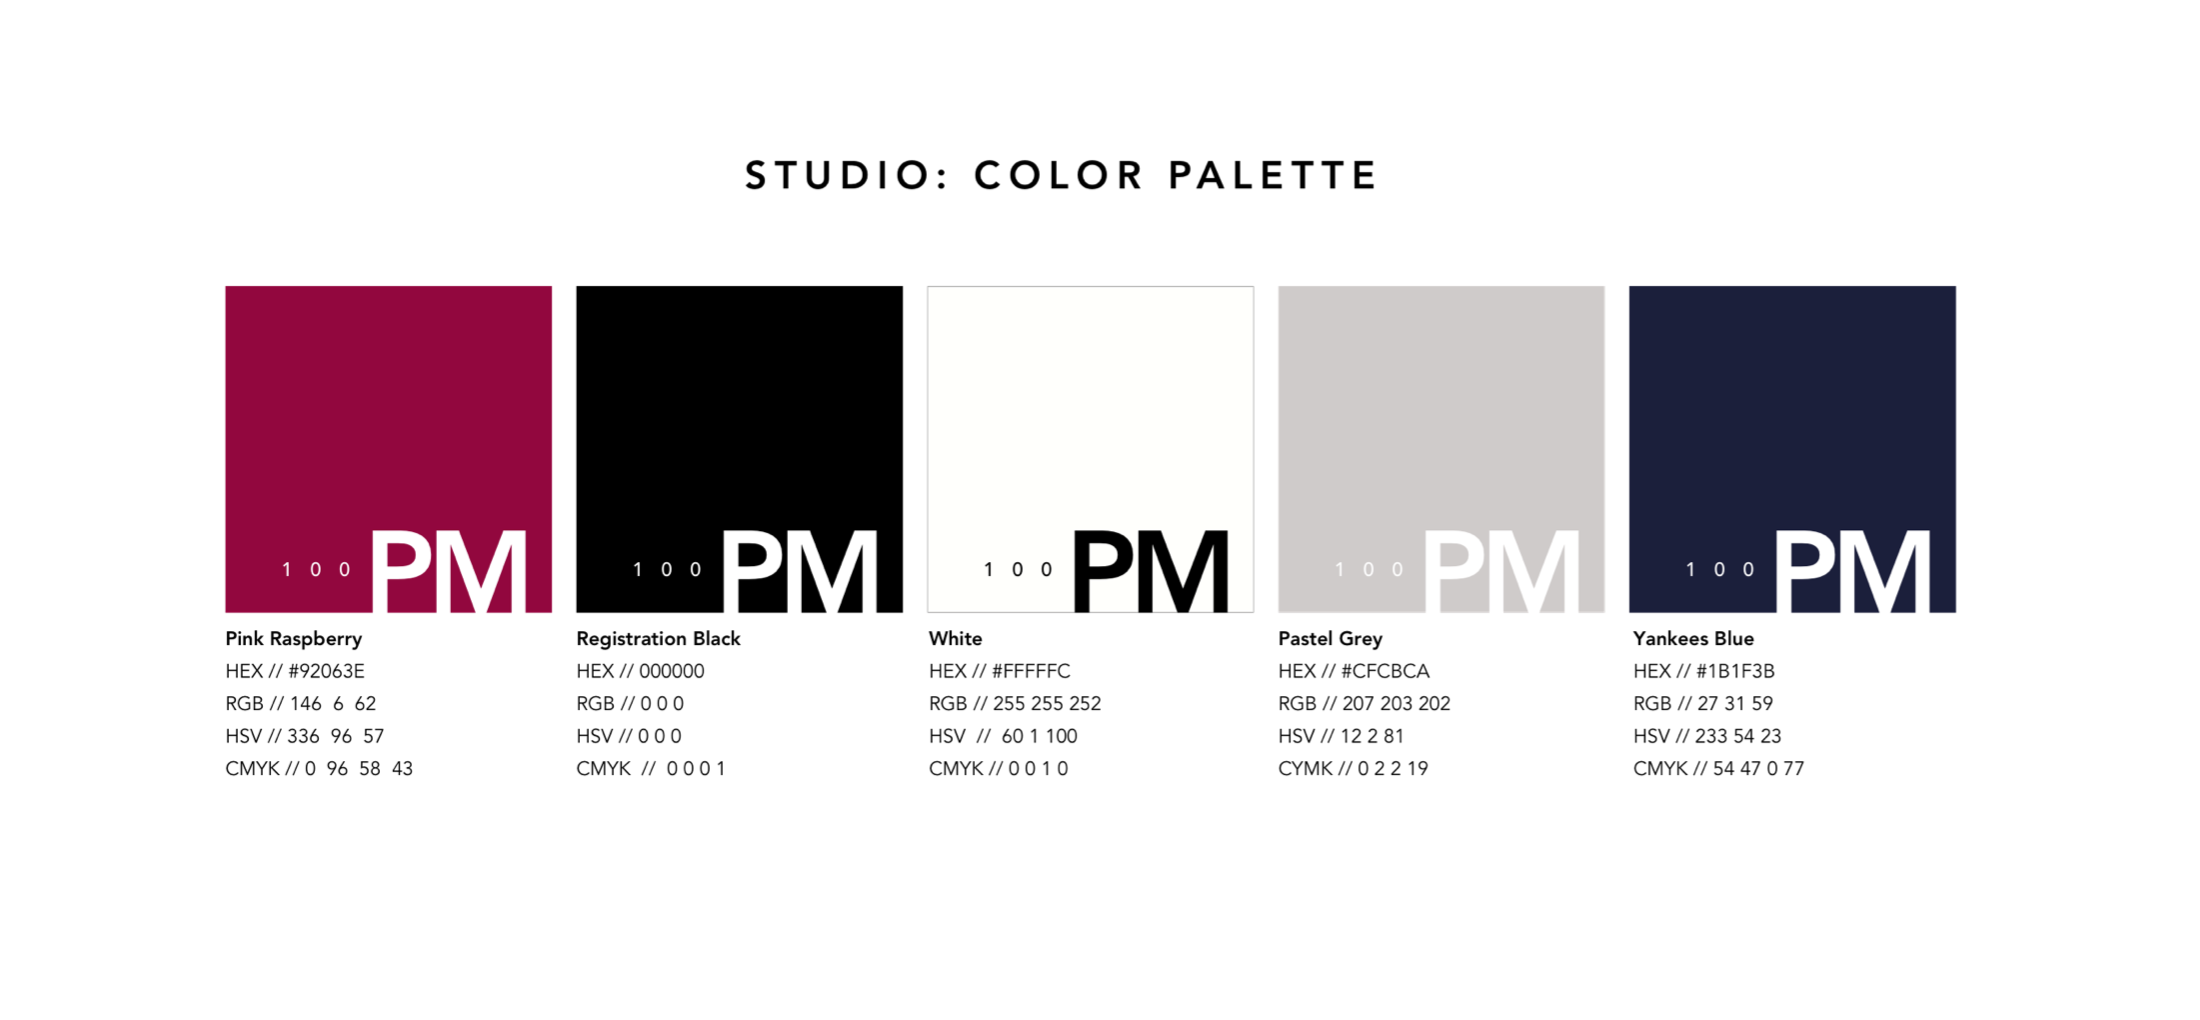 San Do UX Designer 100 Product Managers Color Pallette